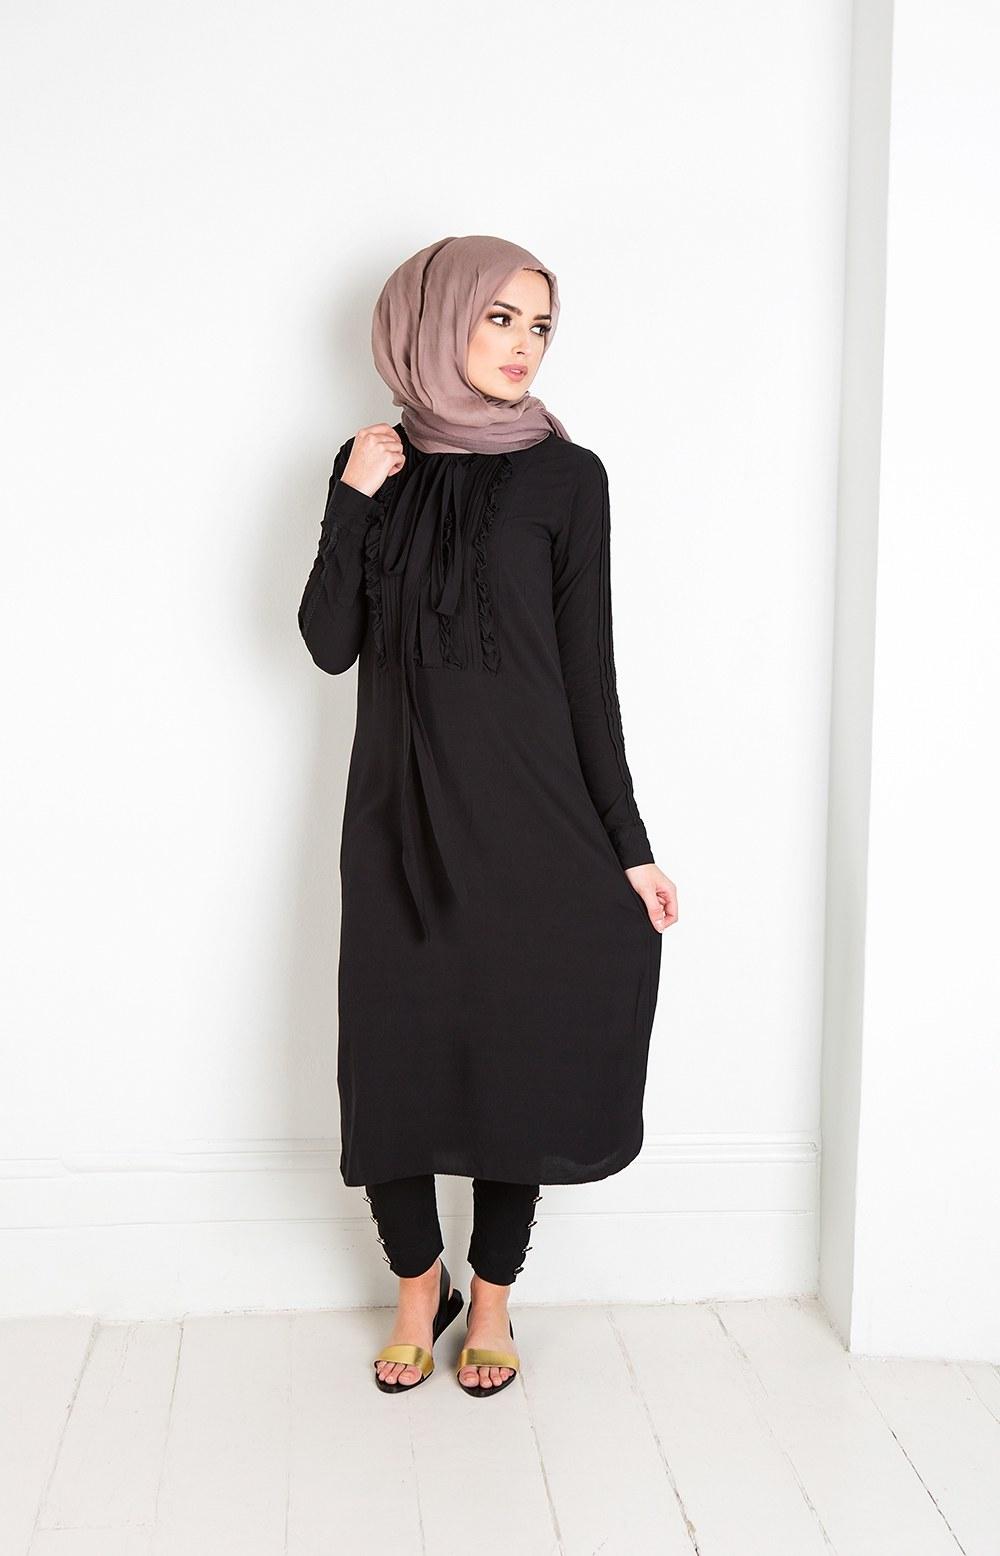 Bentuk Baju Lebaran 2016 H9d9 25 Trend Model Baju Muslim Lebaran 2018 Simple & Modis